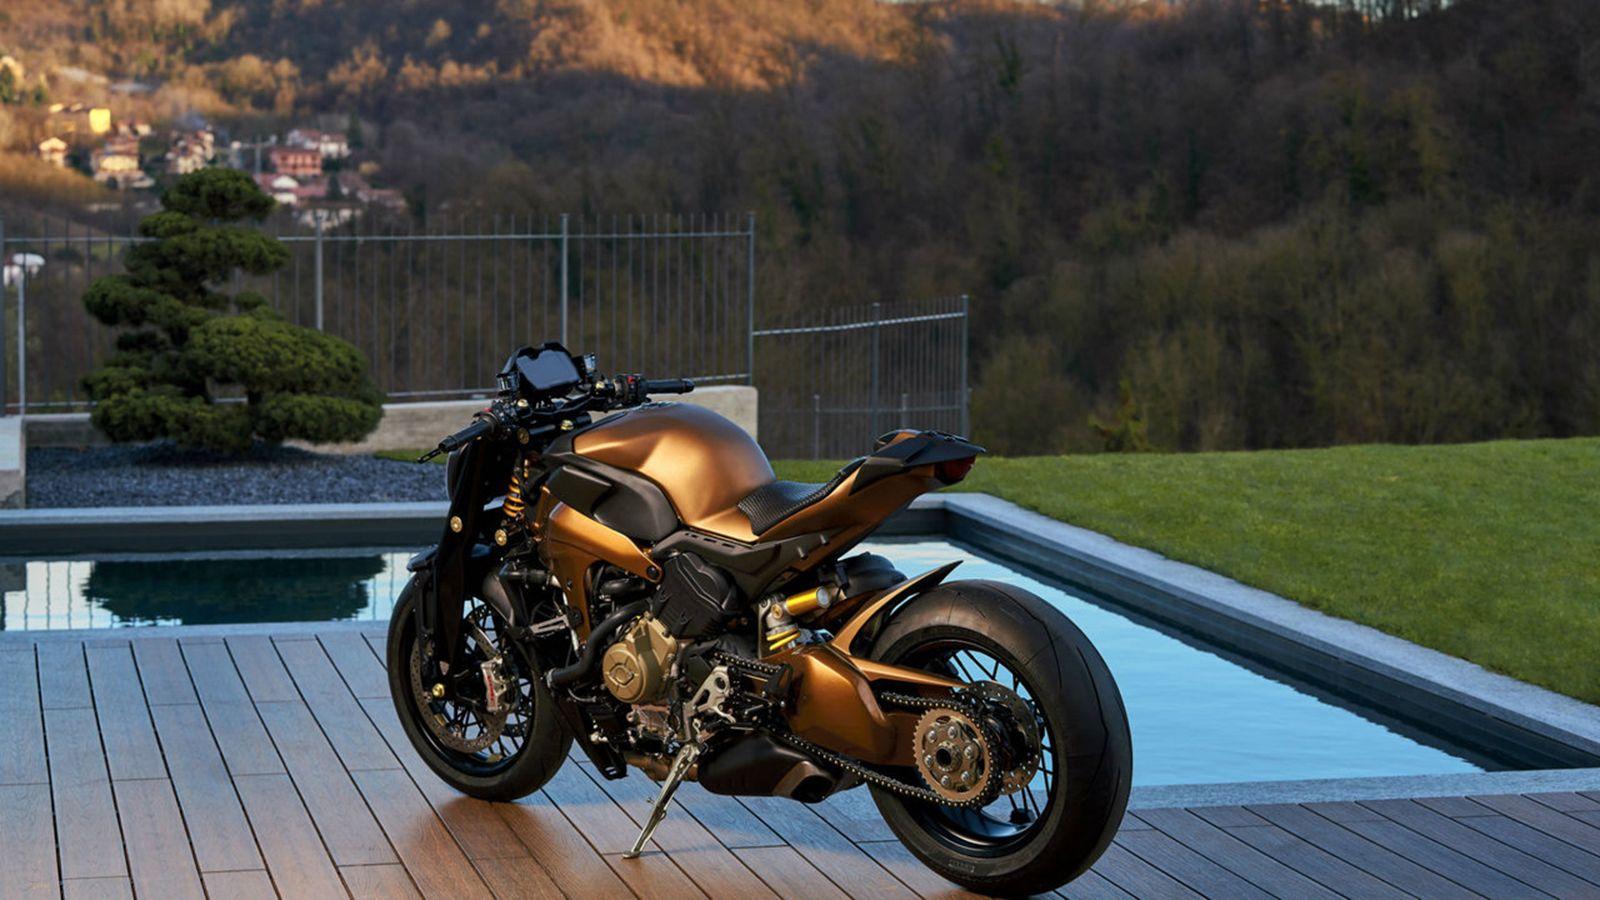 V4 Penta: Naked bike op basis van Ducati Panigale V4